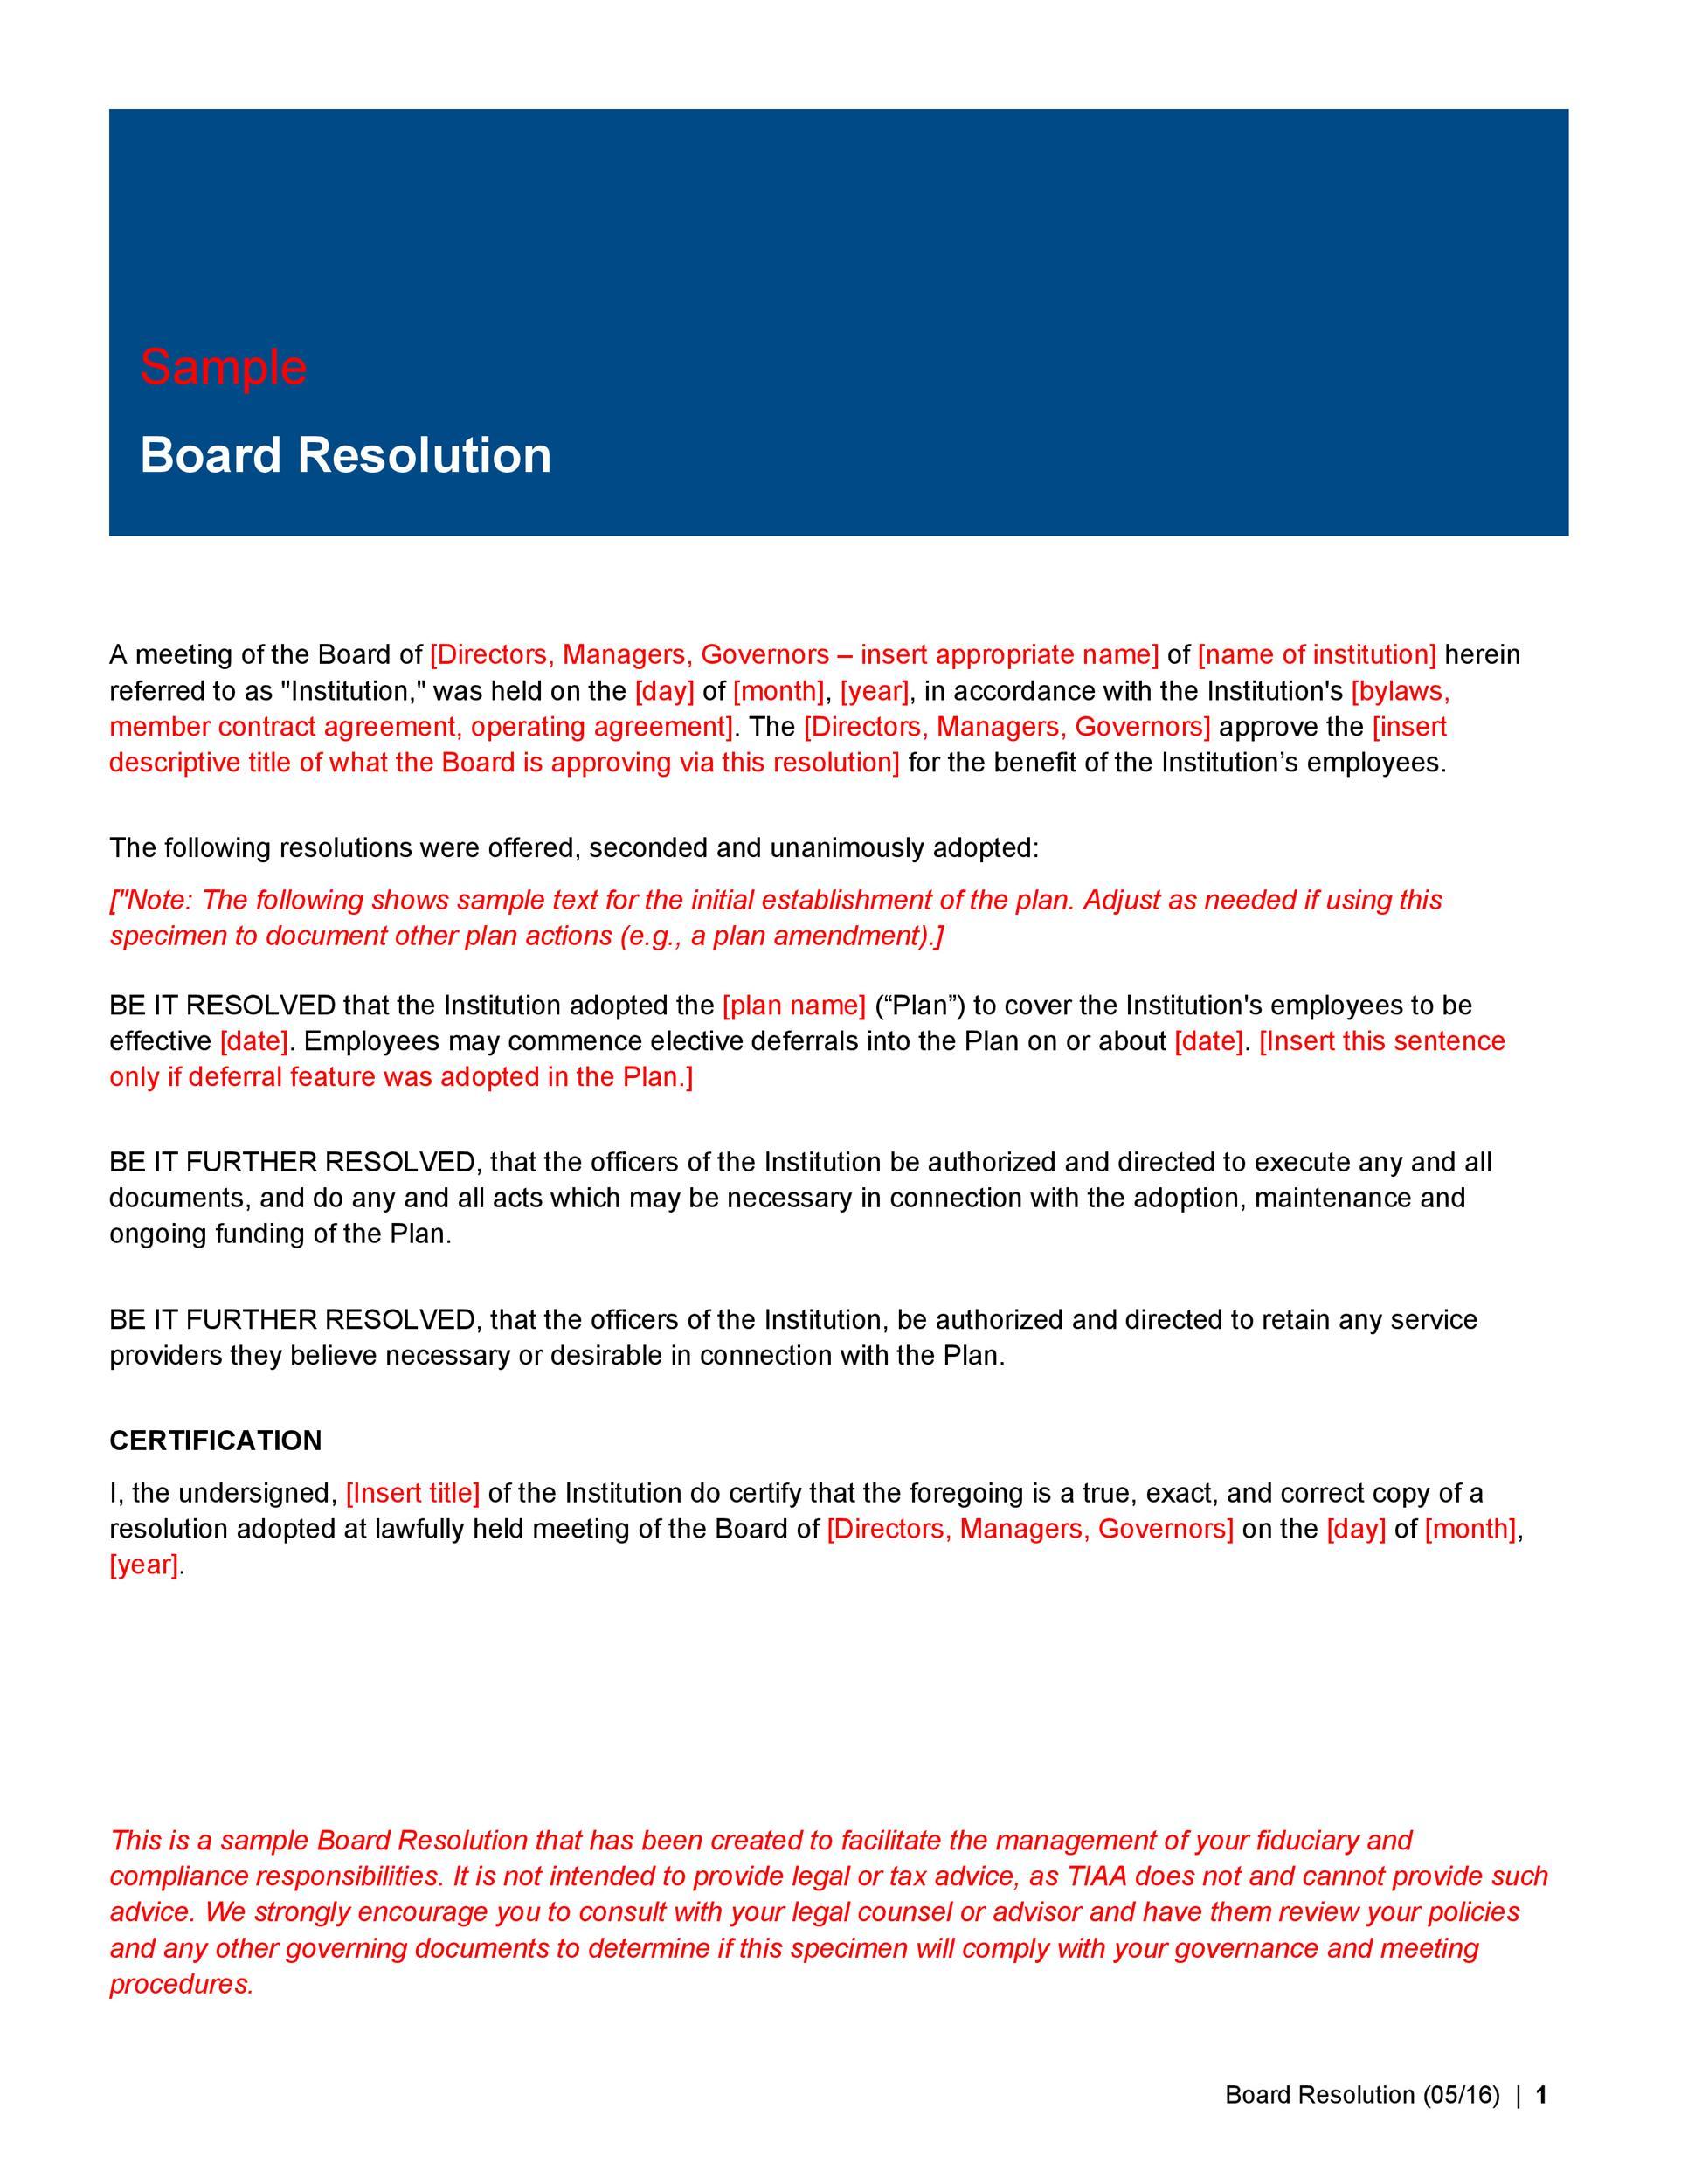 51 Best Board Resolution Templates & Samples ᐅ TemplateLab